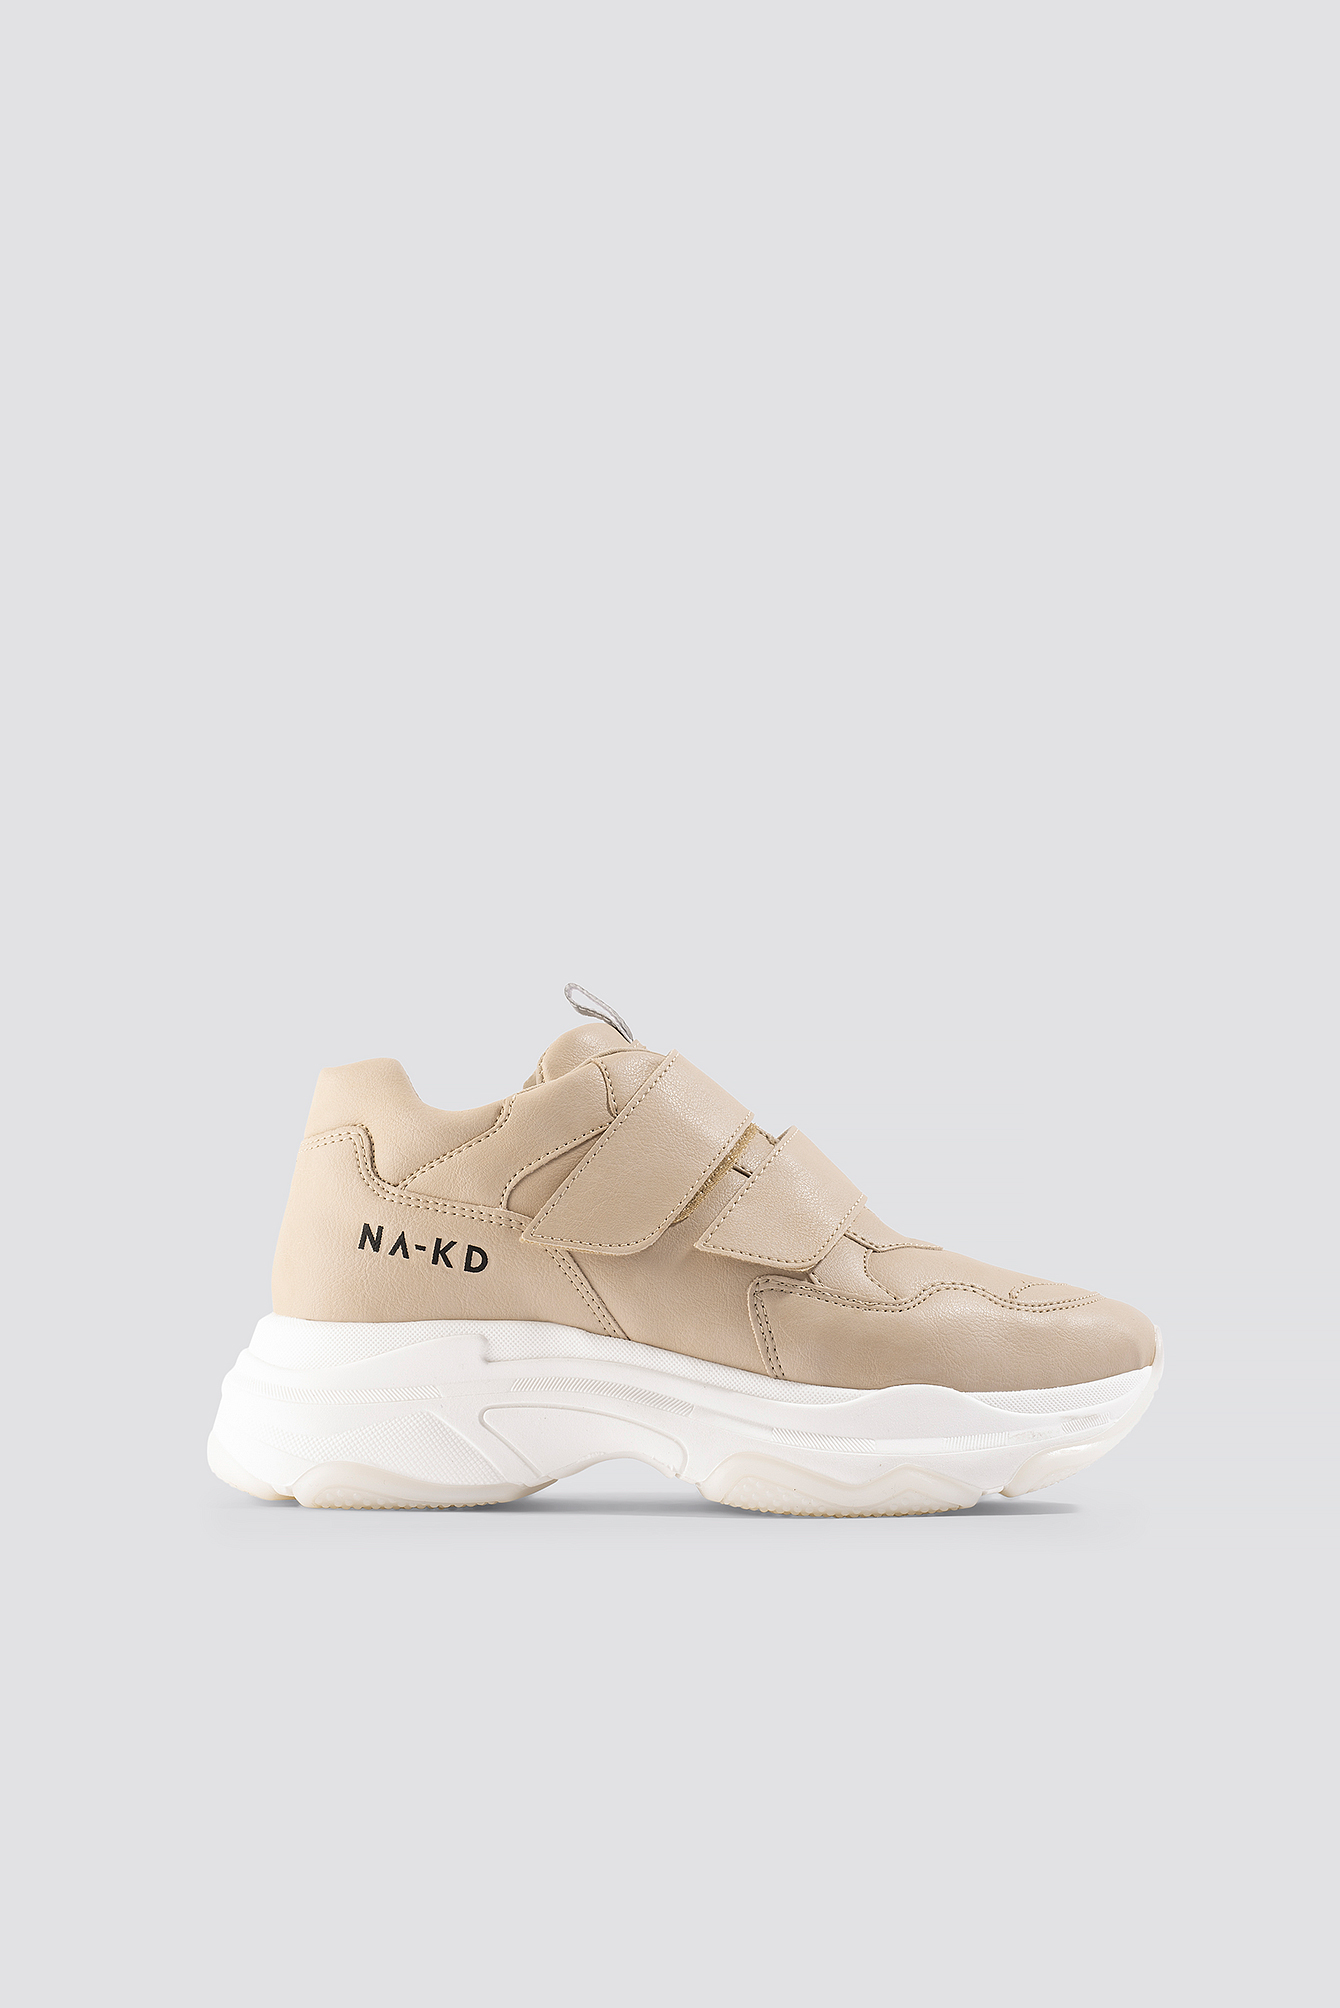 na-kd shoes -  Velcro Chunky Trainers - Beige